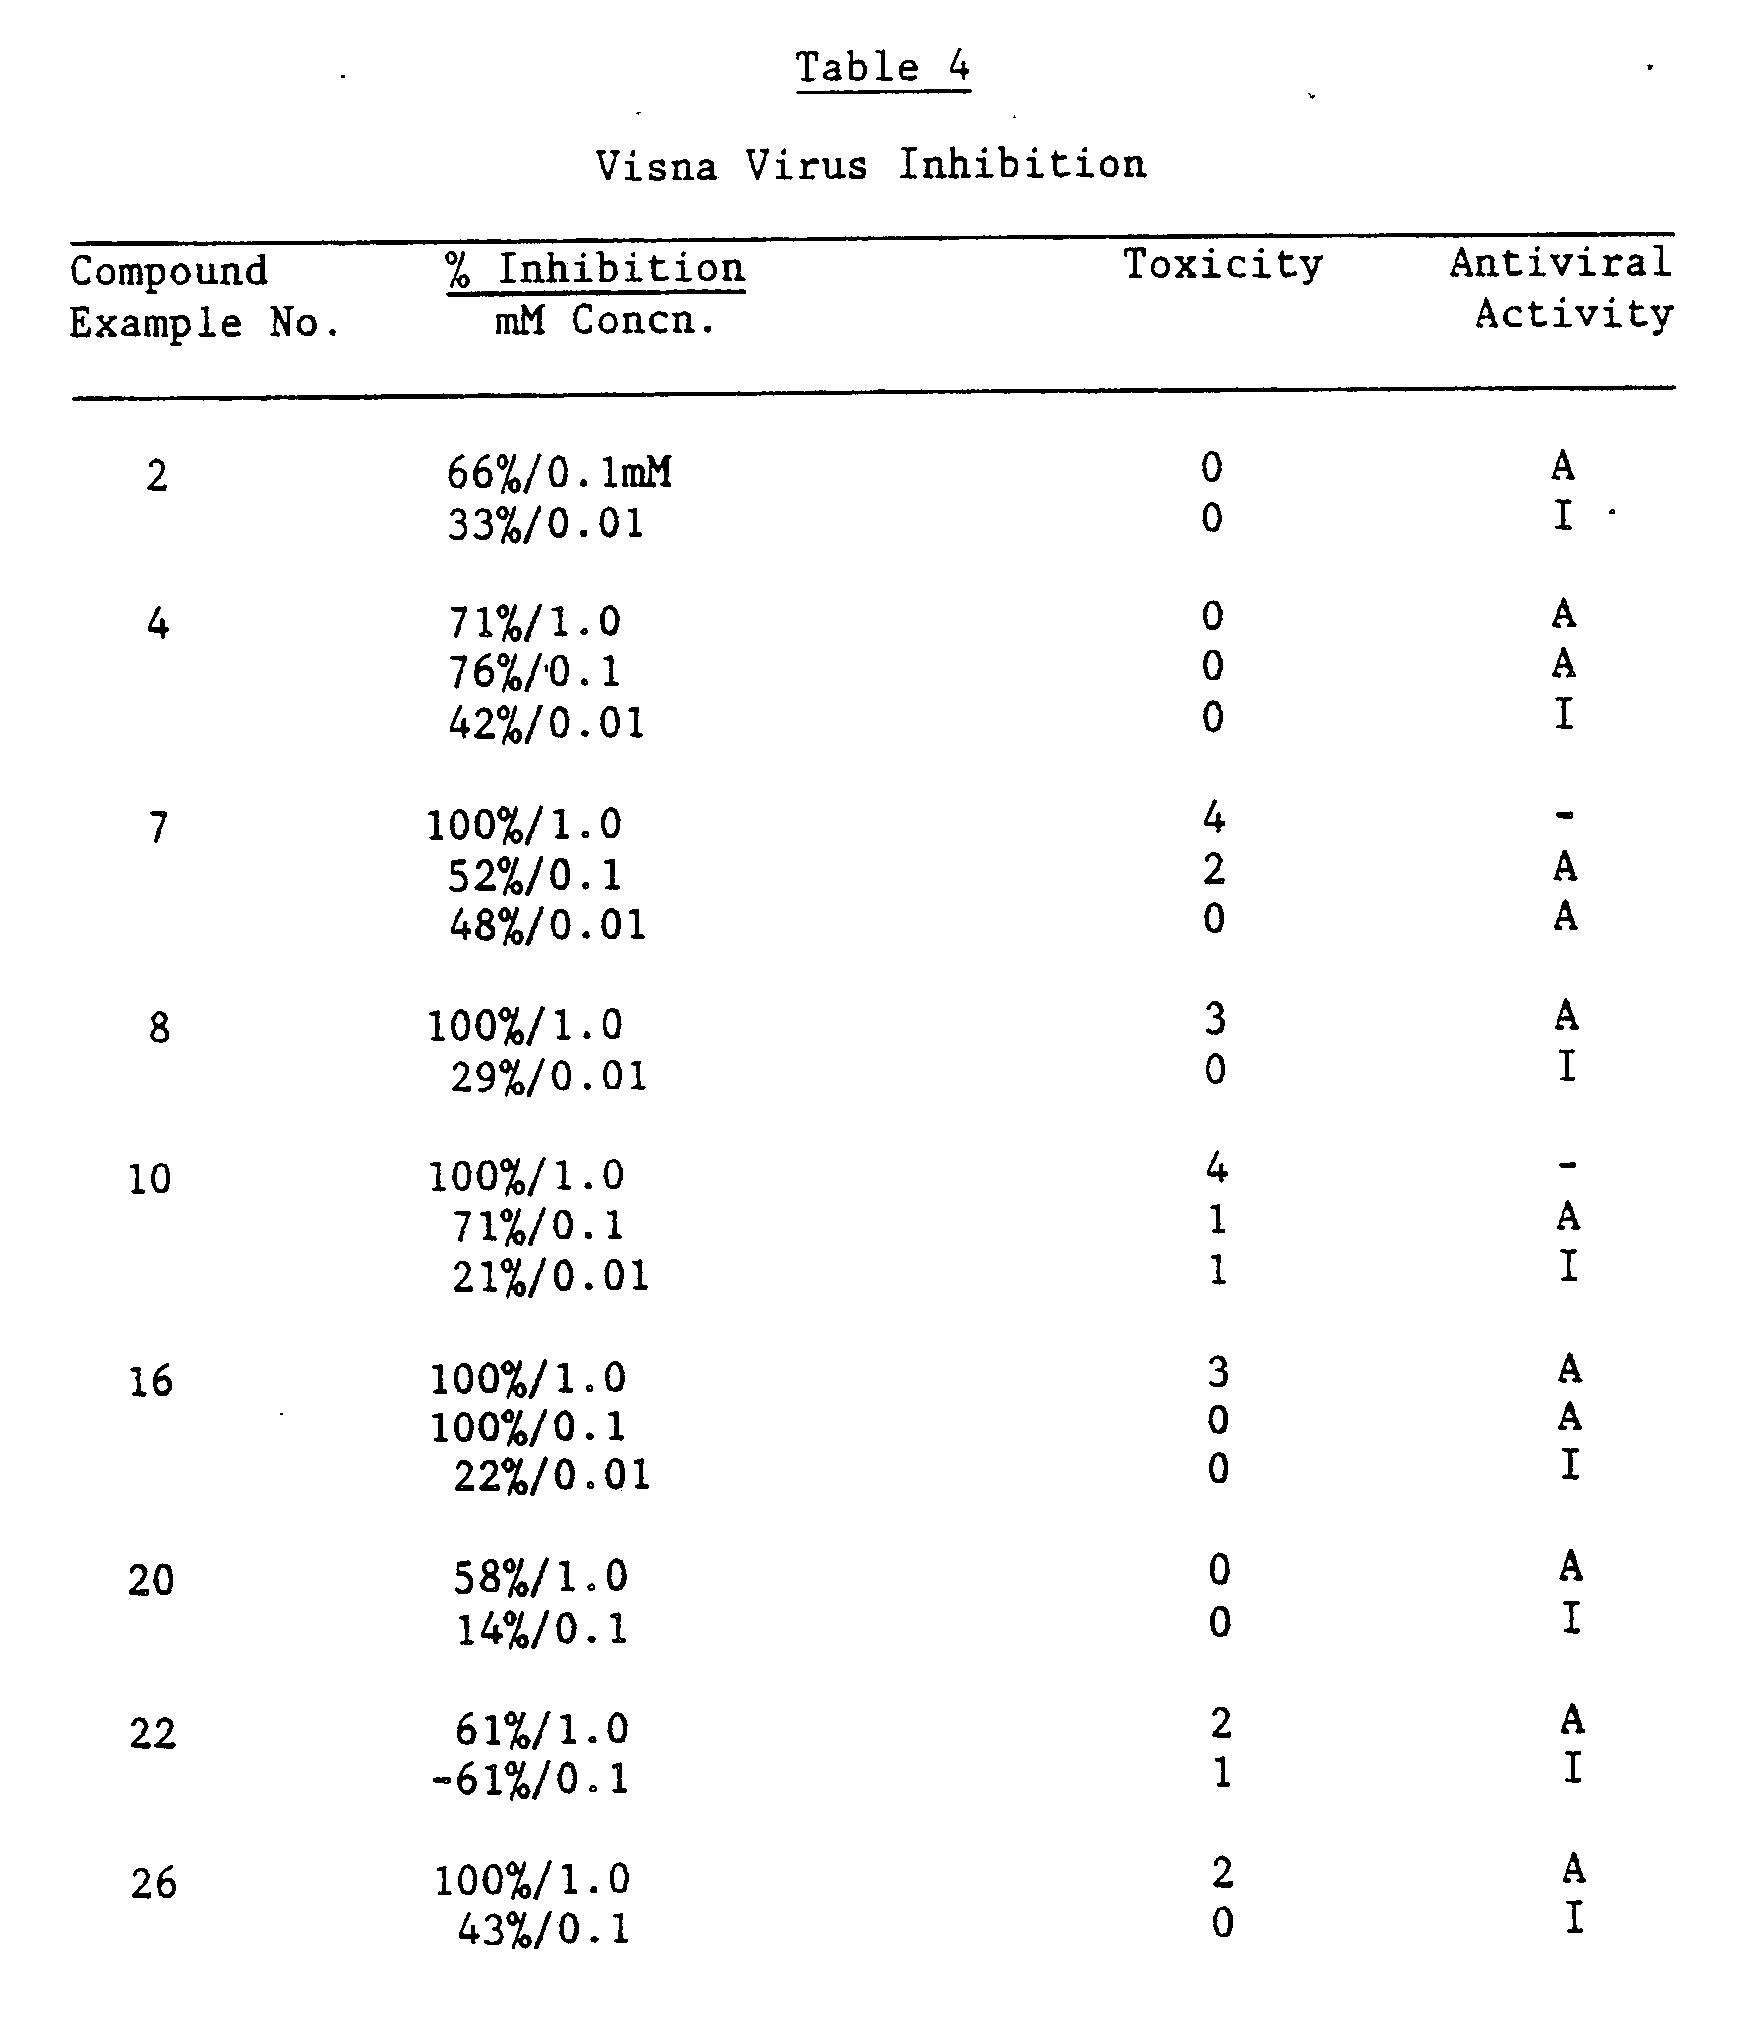 EP0367747A2 - Dideoxy-L-arabinitol derivatives as antiviral